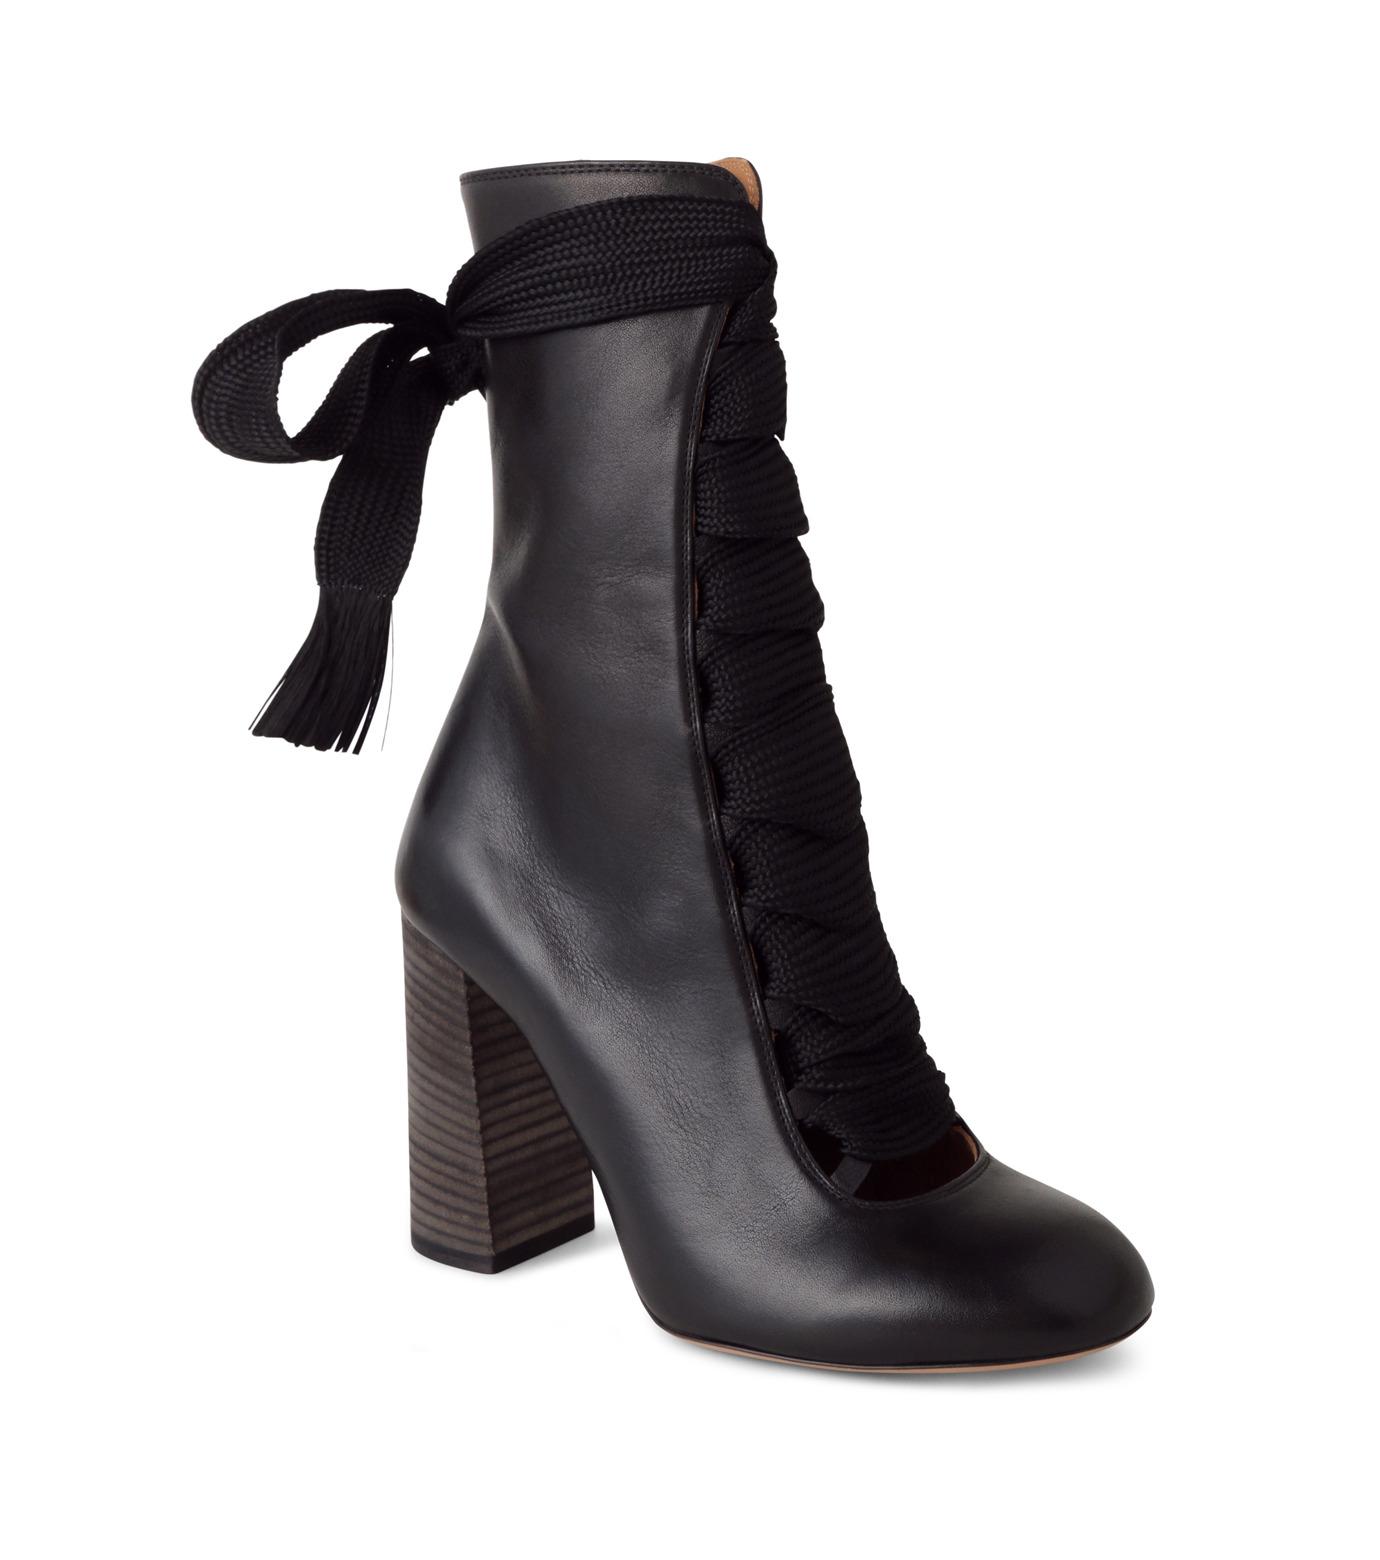 Chloe(クロエ)のharper lace up boots-BLACK(ブーツ/boots)-5534E42B-13 拡大詳細画像1